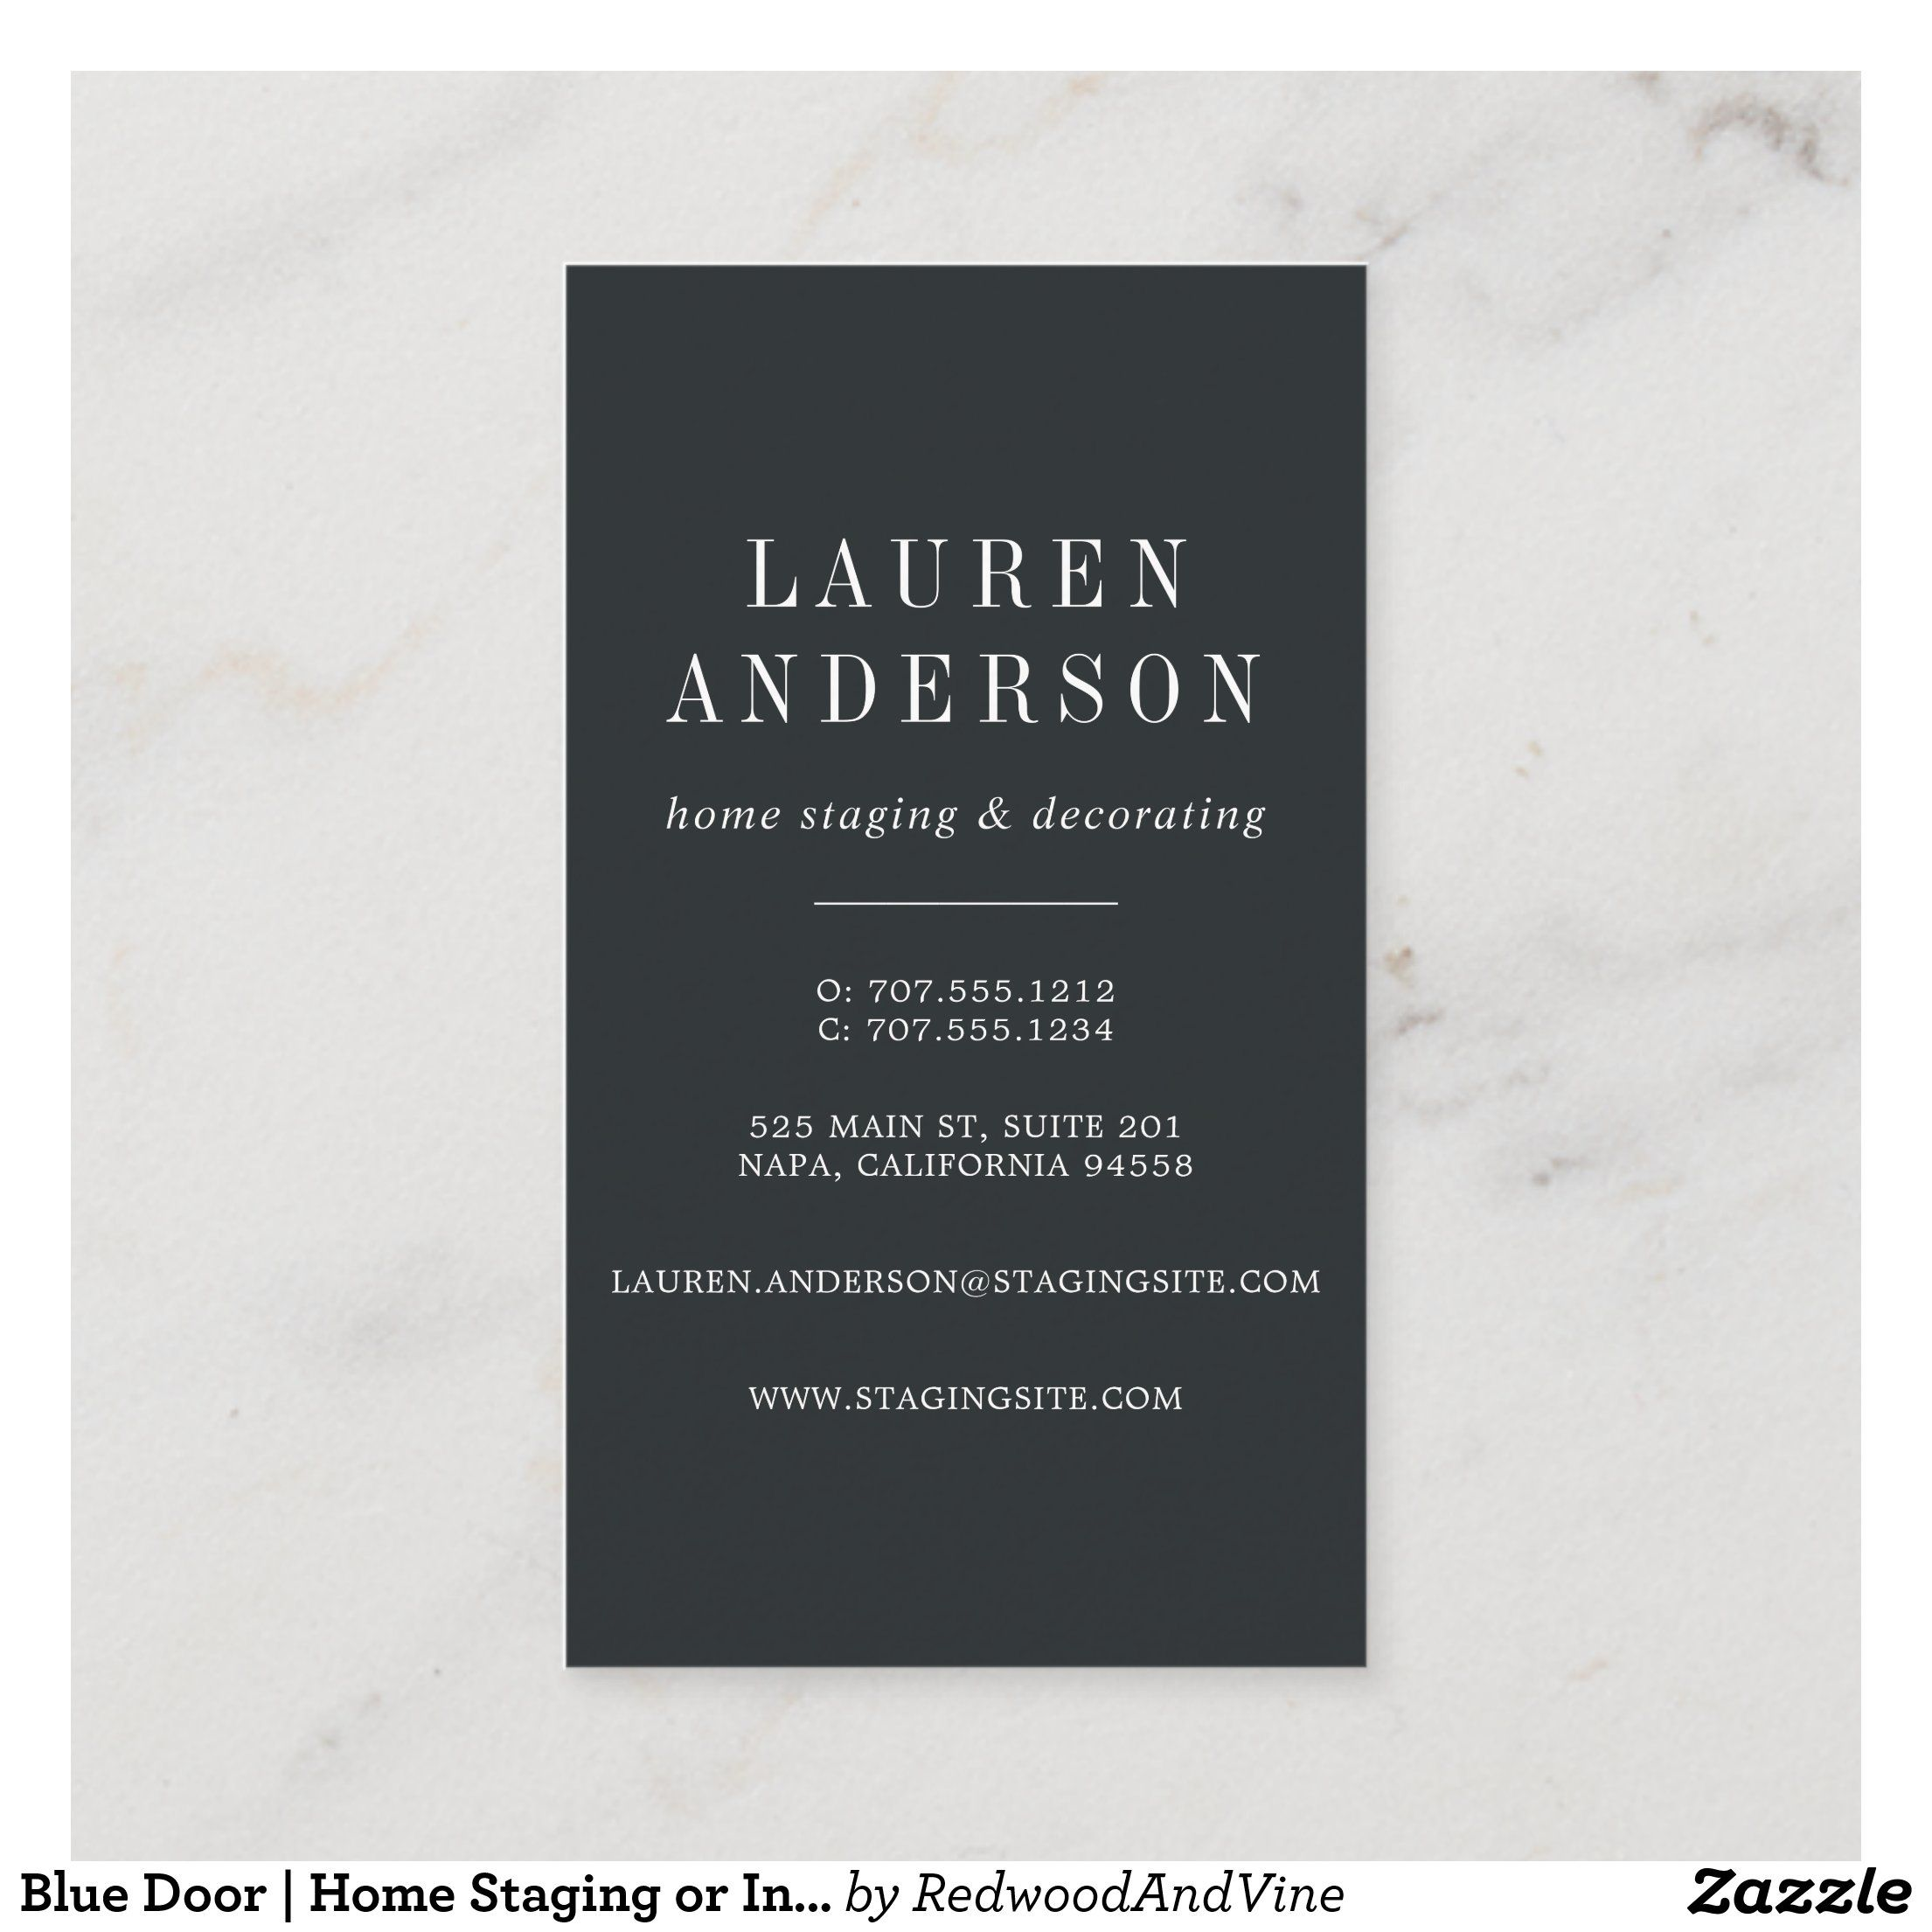 Blue Door Home Staging Or Interior Design Business Card Zazzle Com In 2020 Interior Designer Business Card Business Card Design Interior Design Business